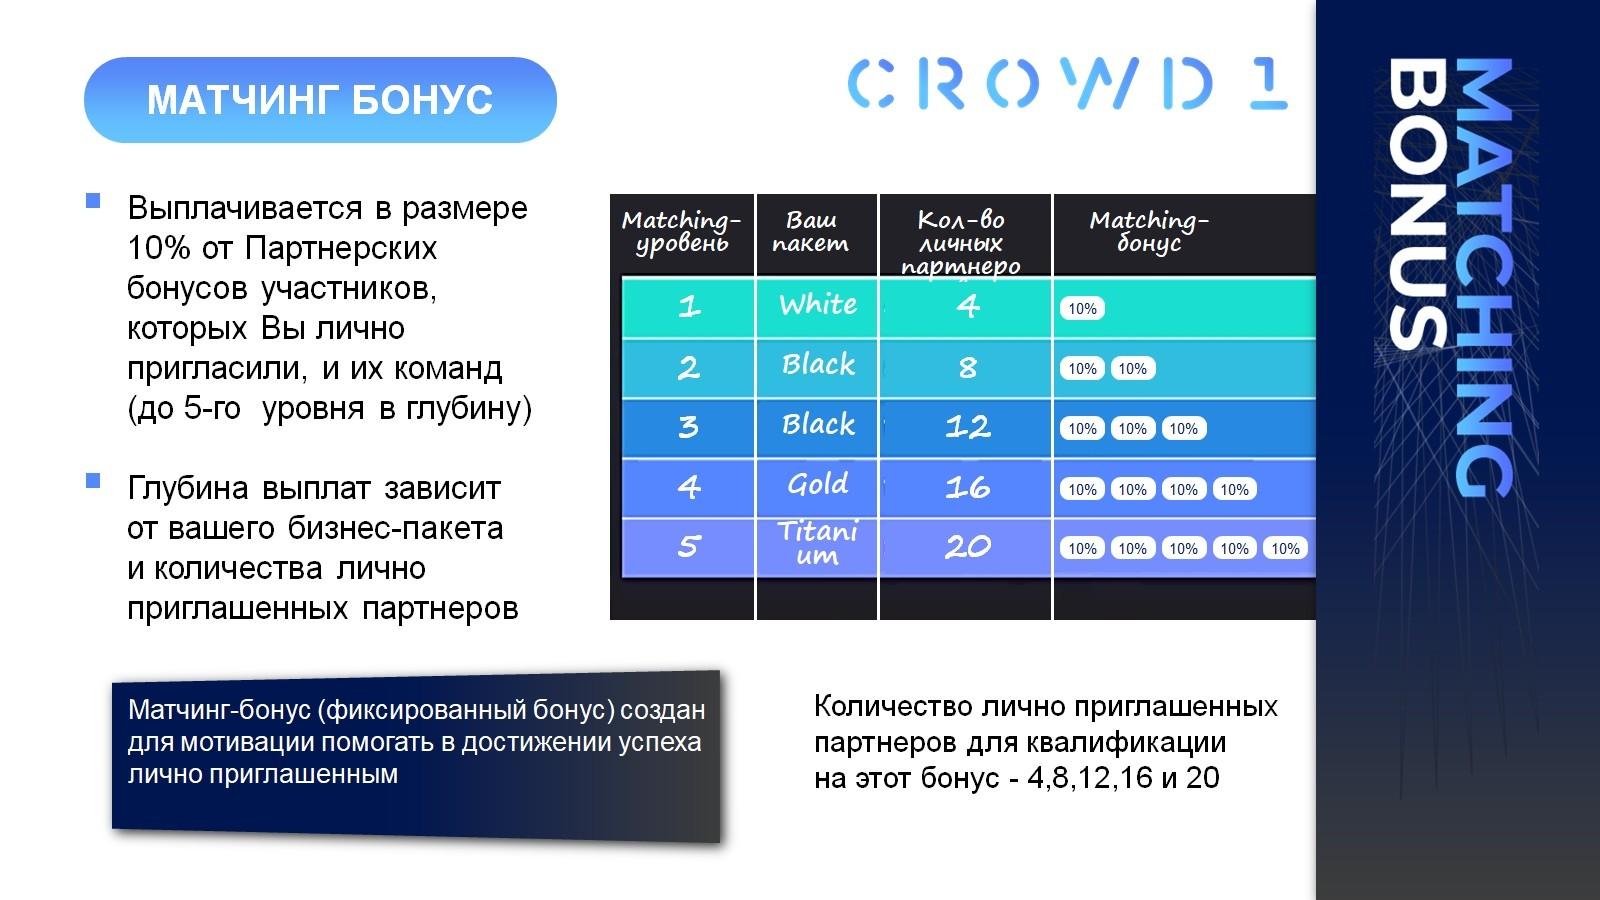 MATCHING BONUS, в проекте CROWD 1